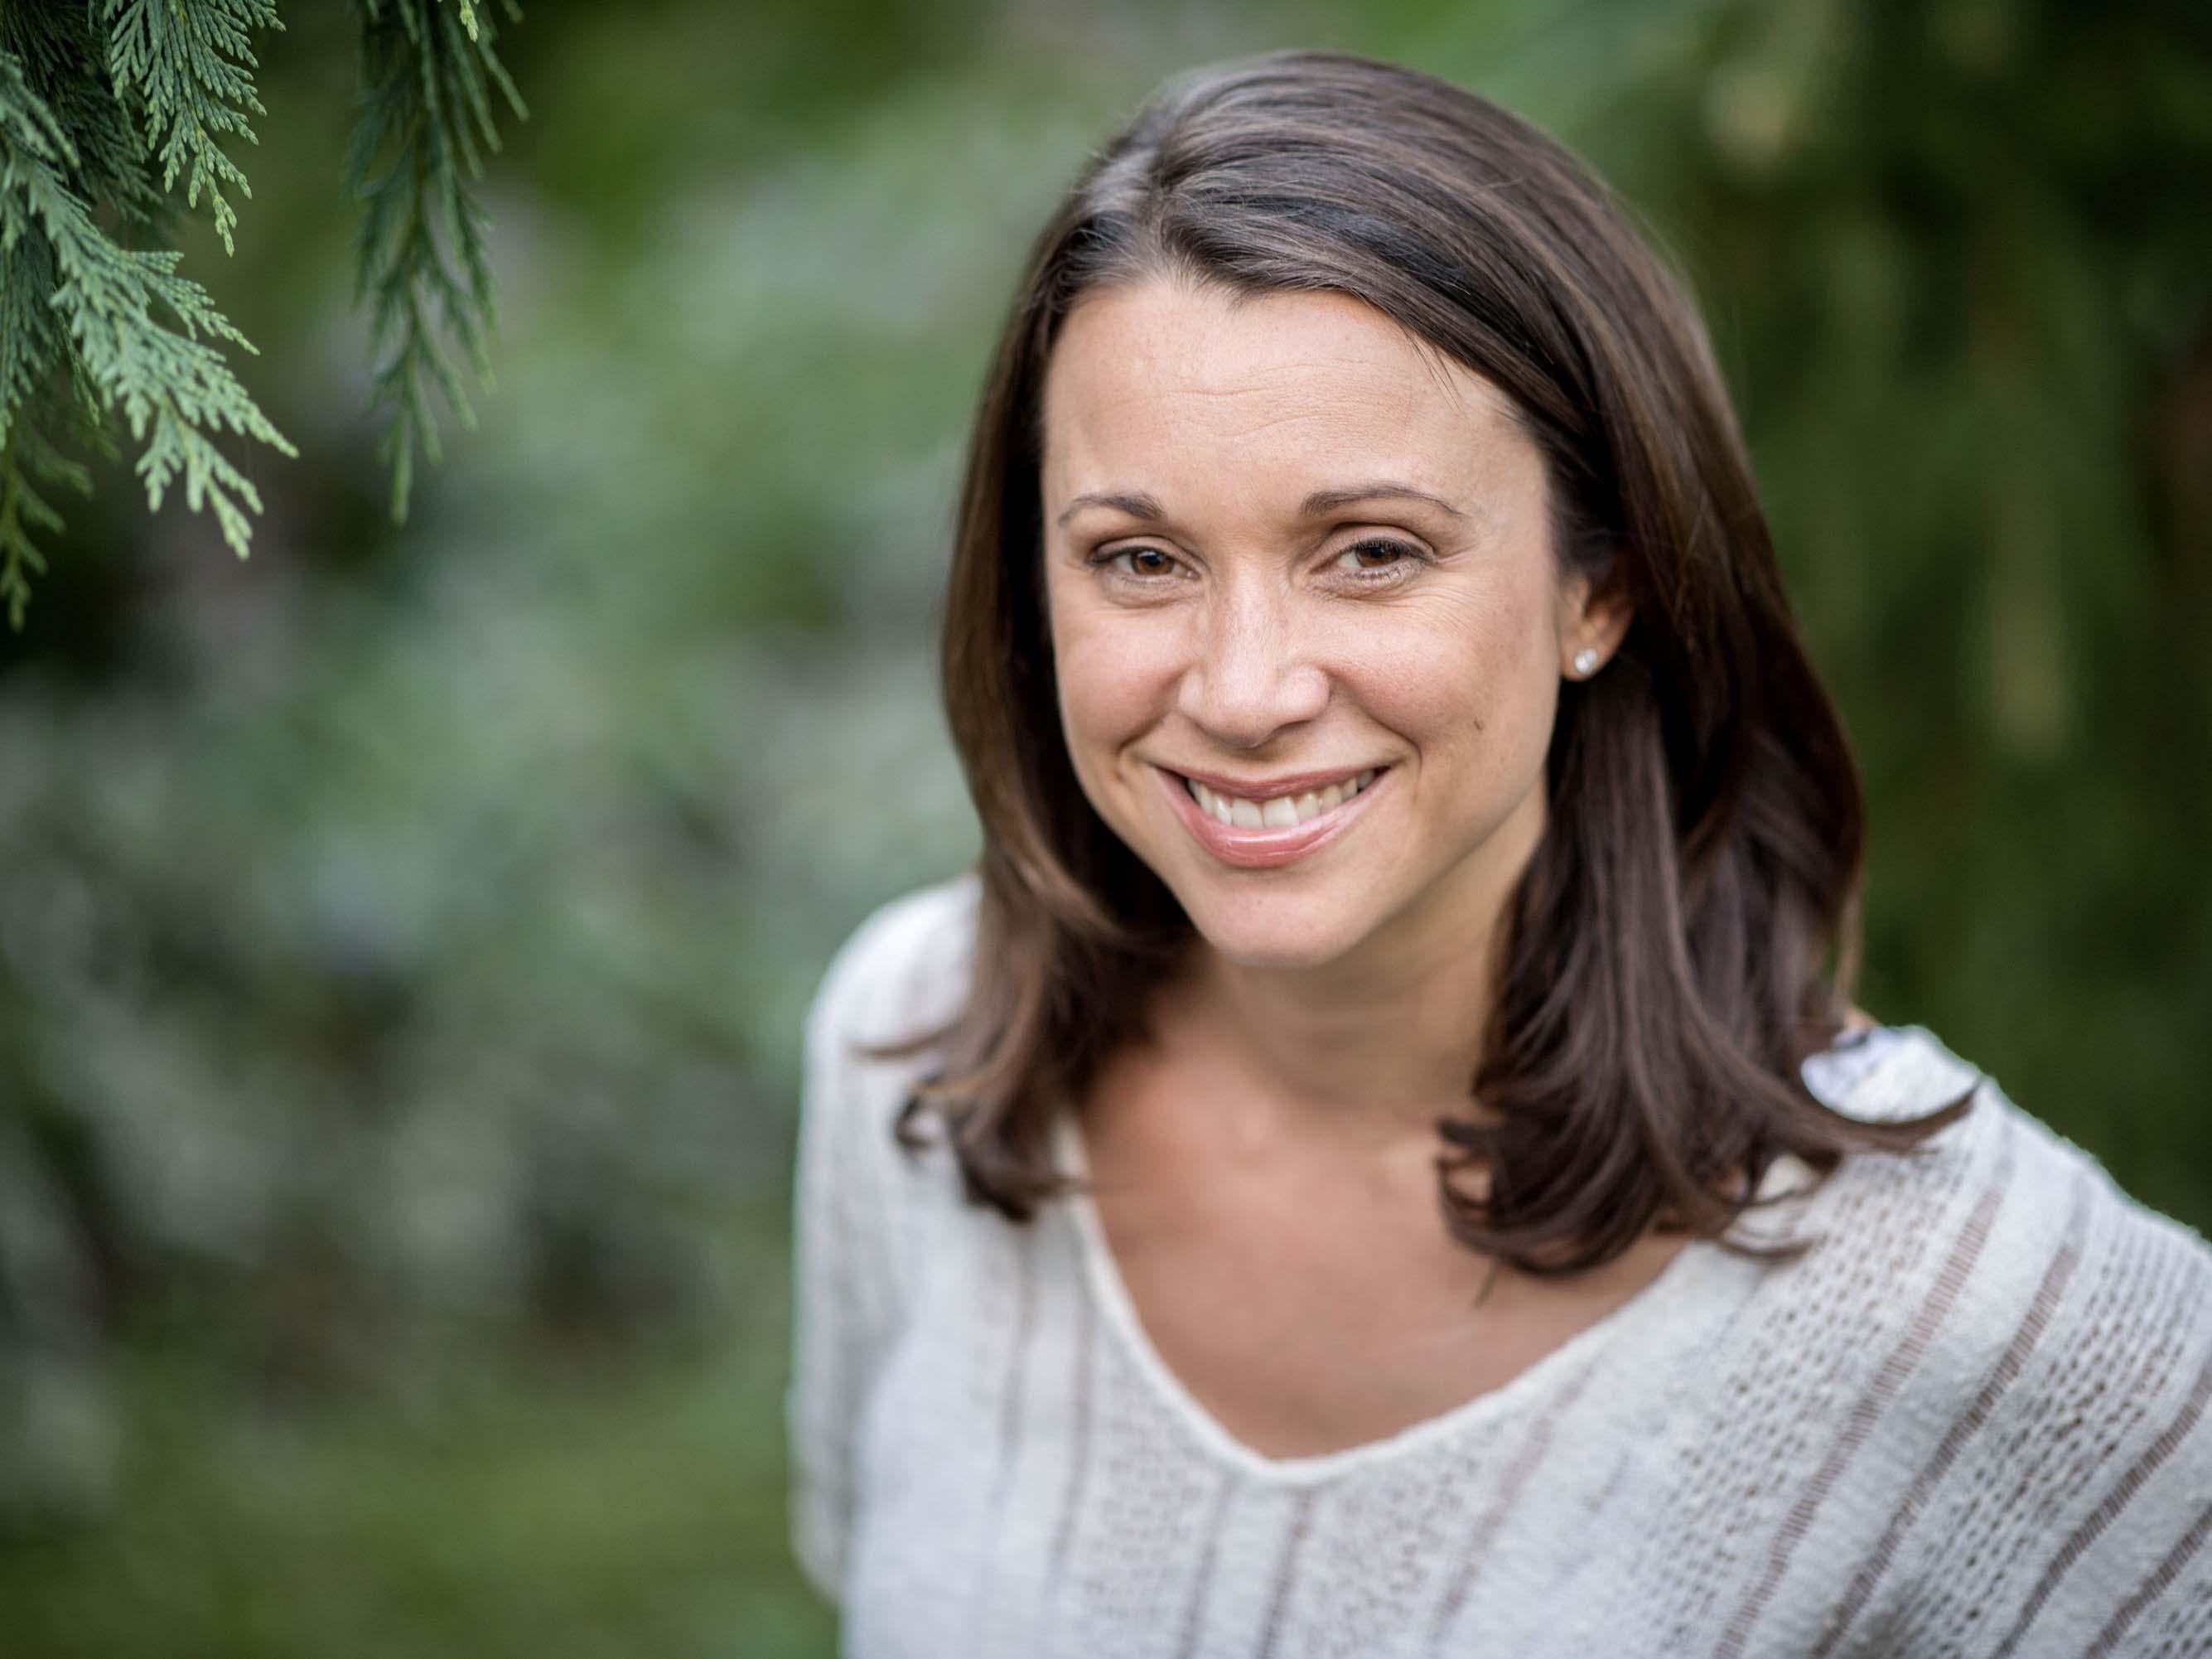 Amanda Lucidon